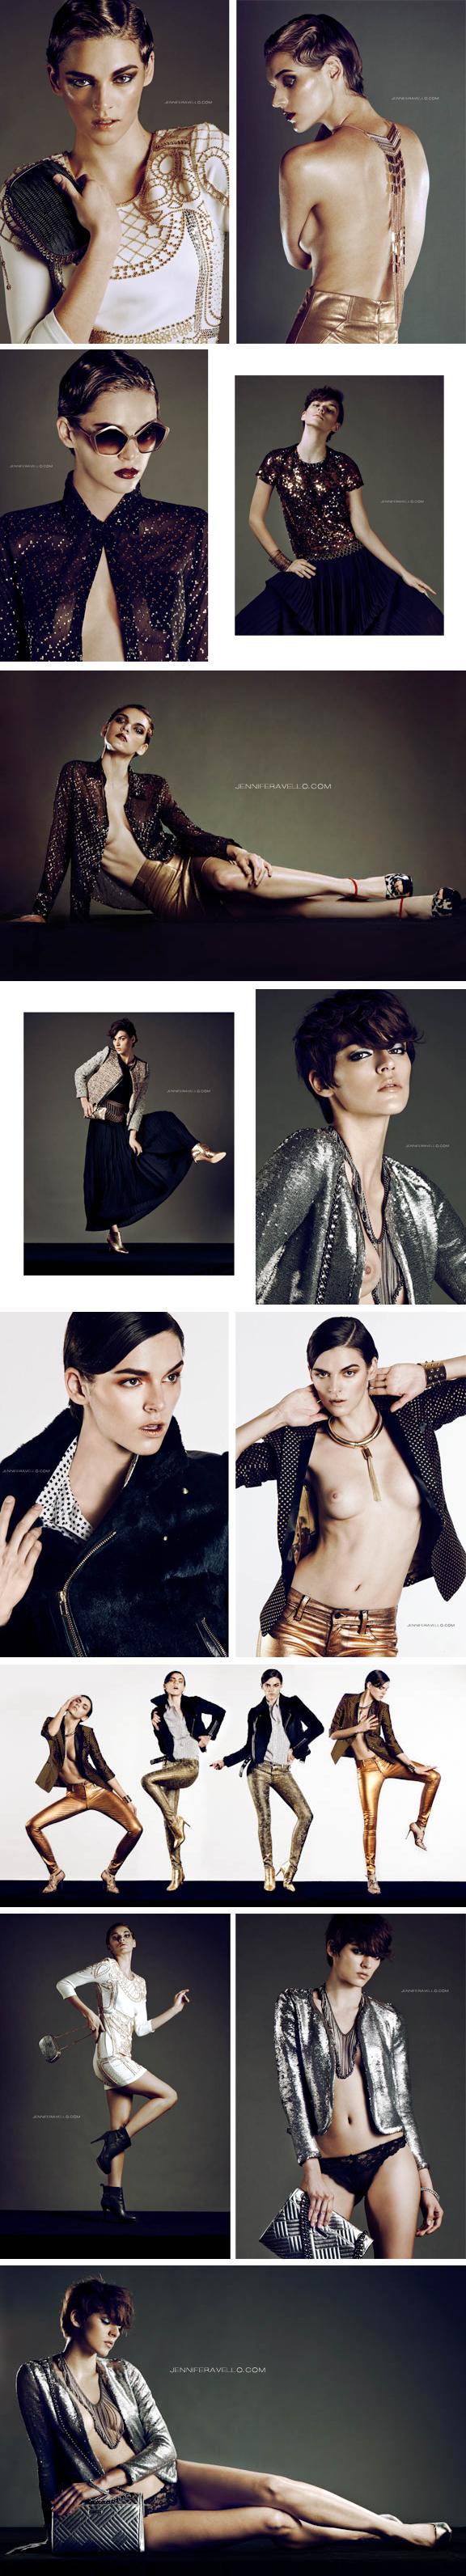 New_York_Fashion_Photographer_JenniferAvello_for_BambiMagazine_IssueXIV